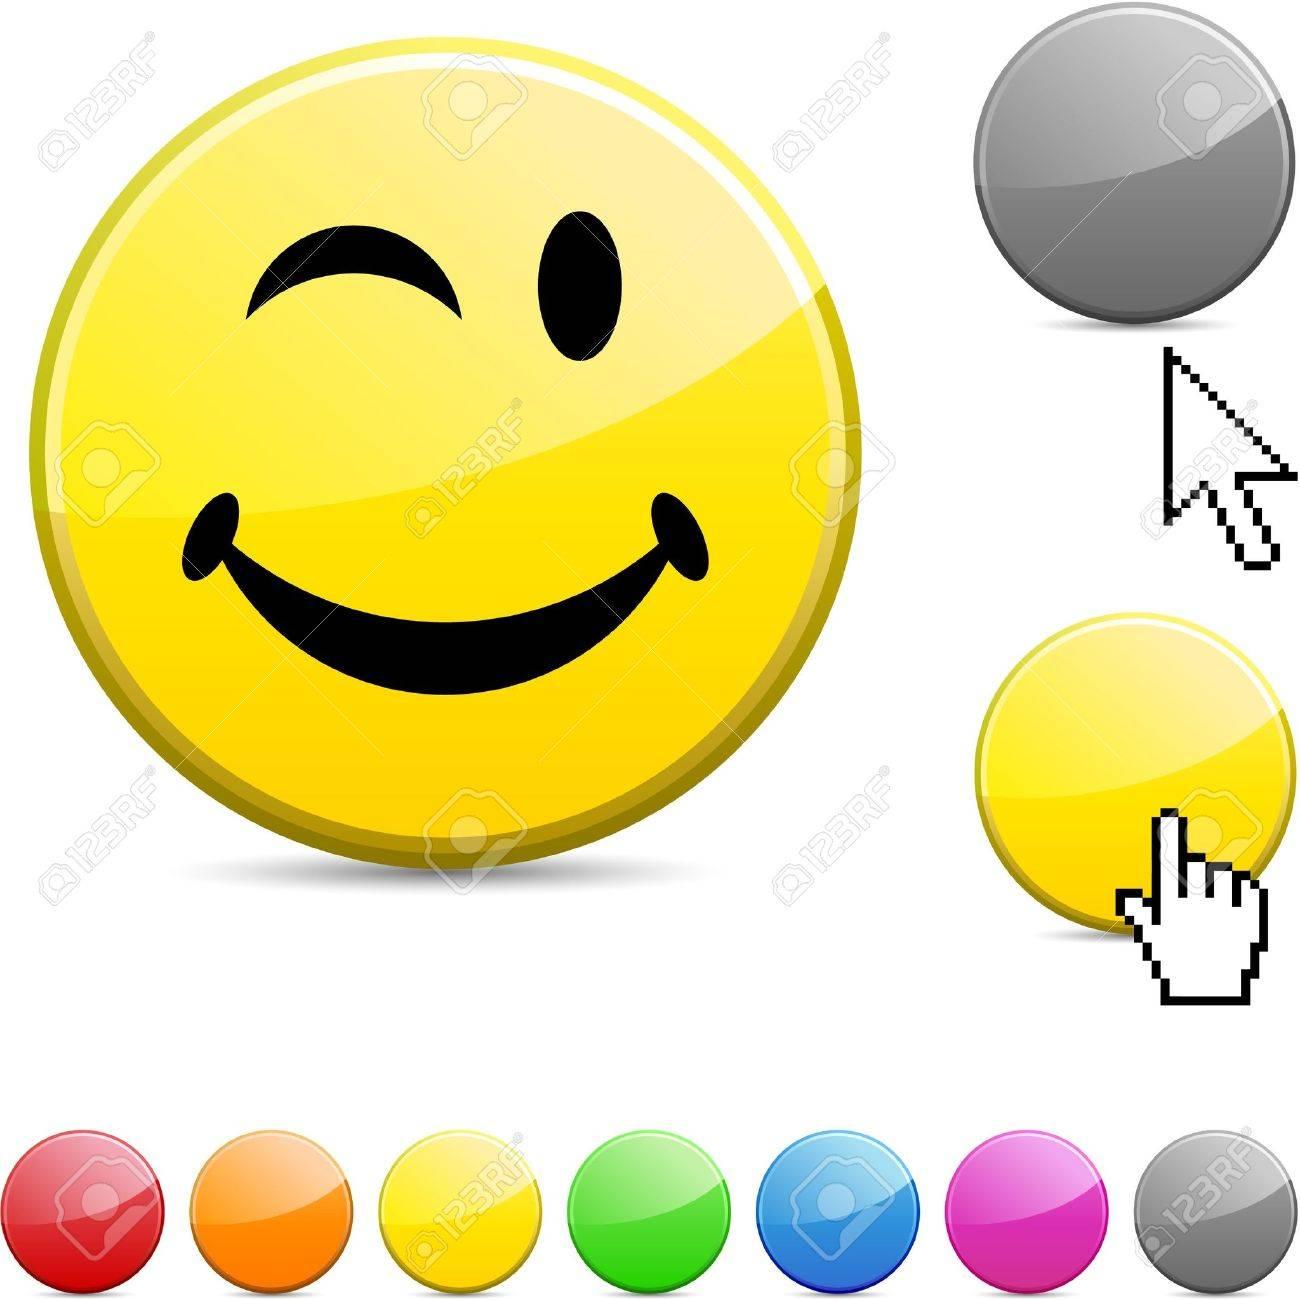 Smiley glossy vibrant round icon. - 7156256